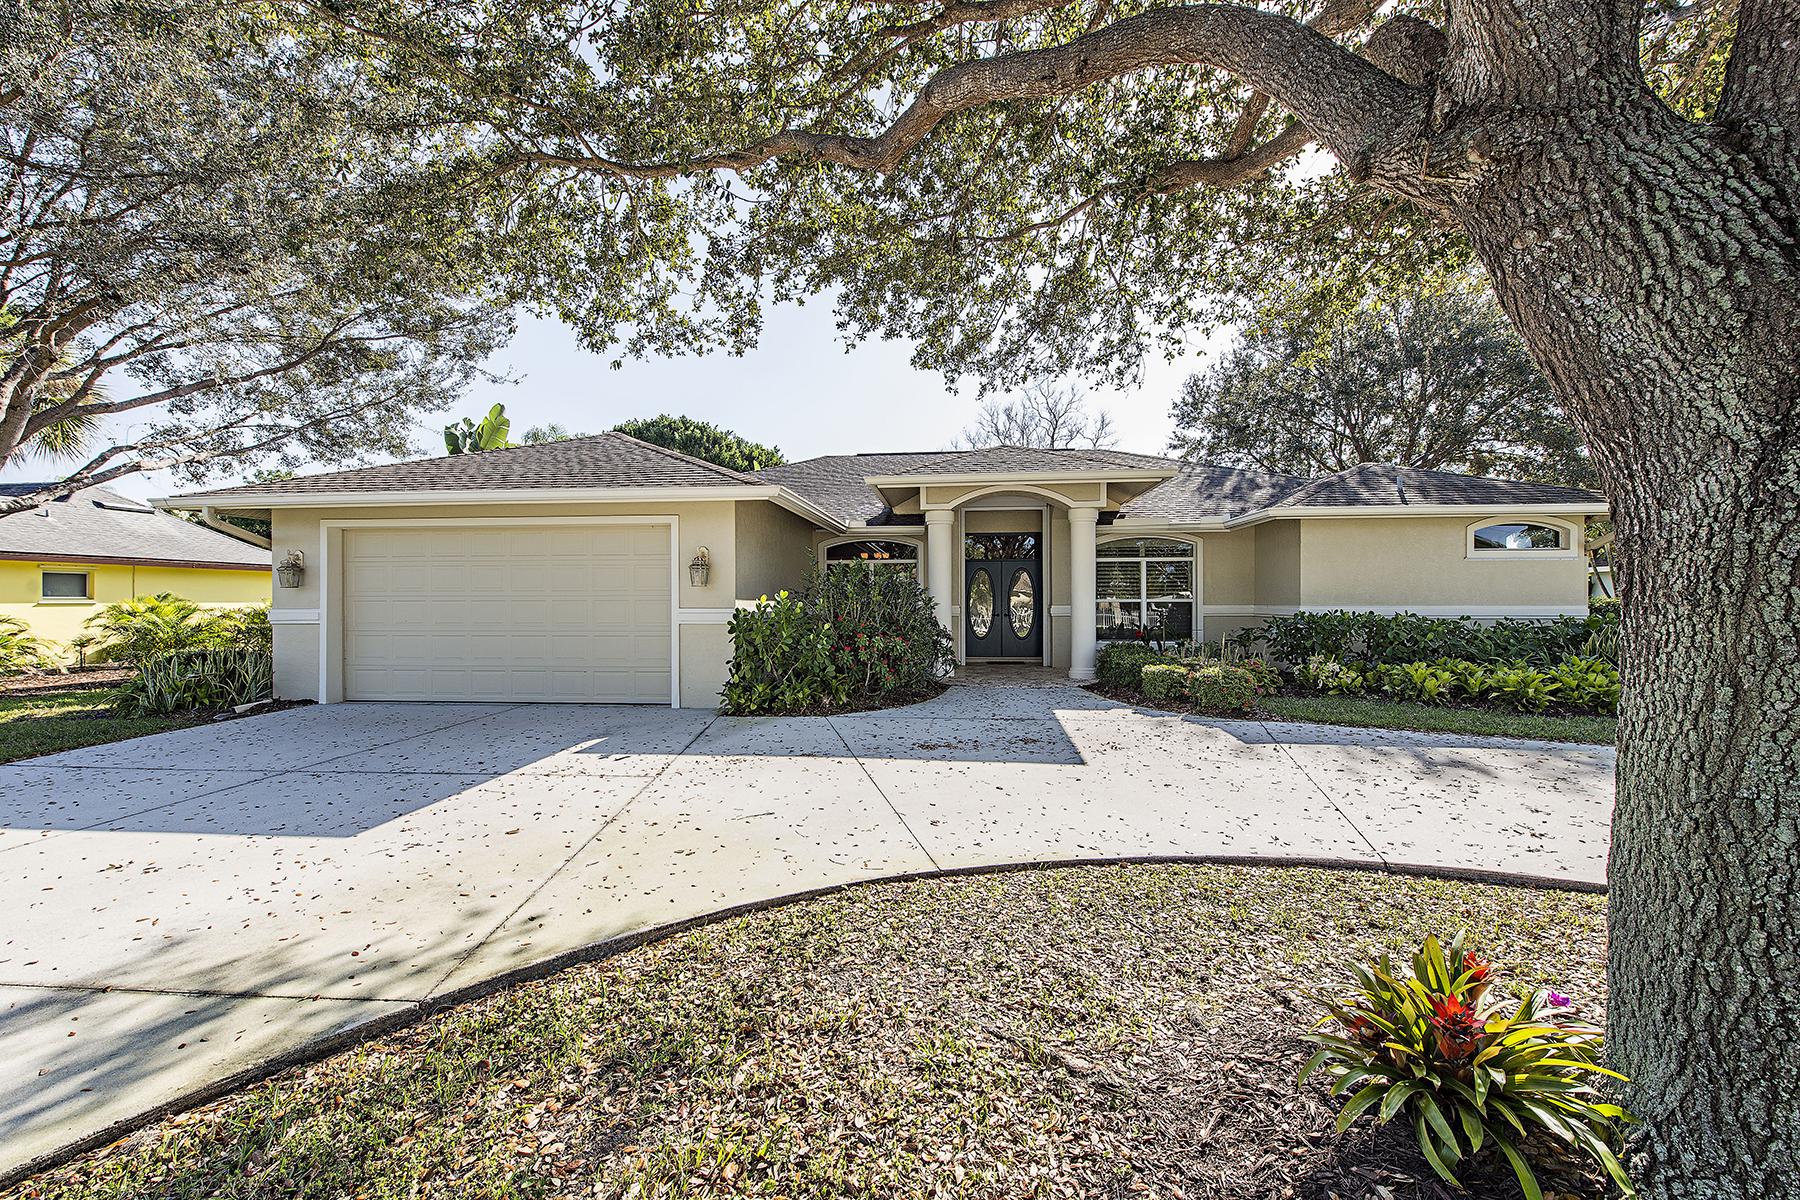 Villa per Vendita alle ore 200 Fairway Cir , Naples, FL 34110 200 Fairway Cir Naples, Florida, 34110 Stati Uniti